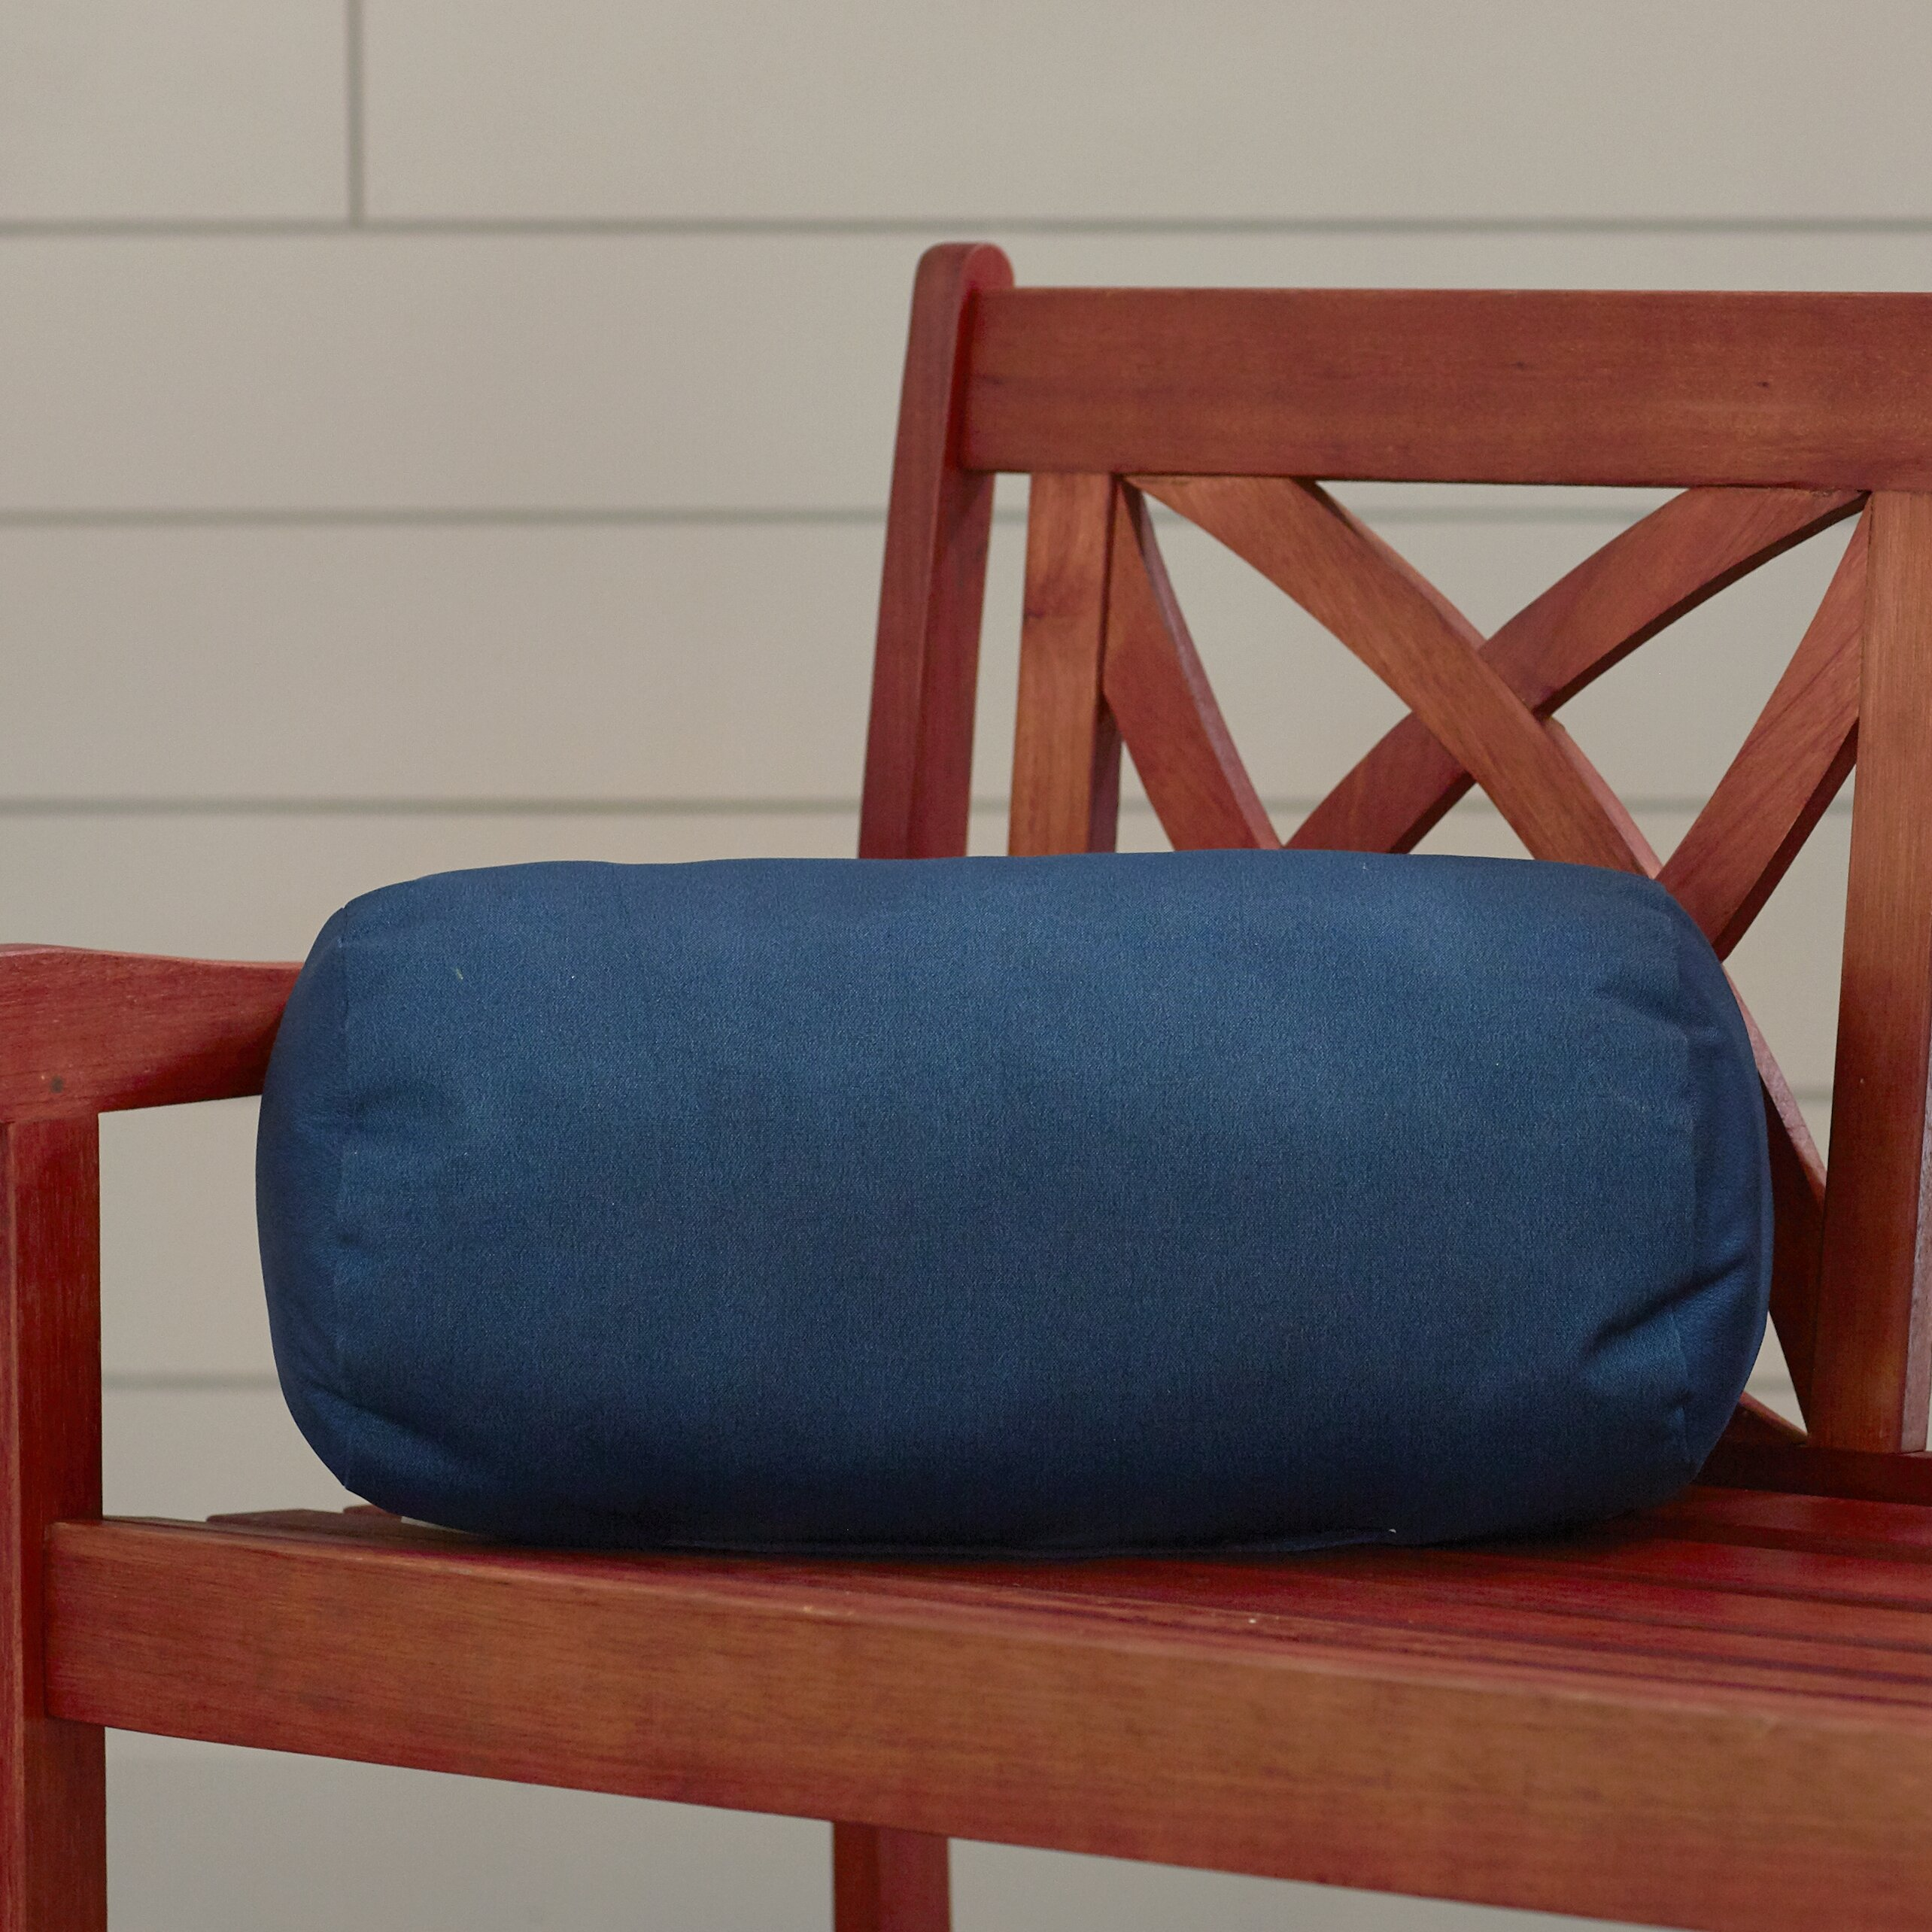 Alcott Hill Vintondale Indoor/Outdoor Solid Round Bolster Pillow & Reviews | Wayfair